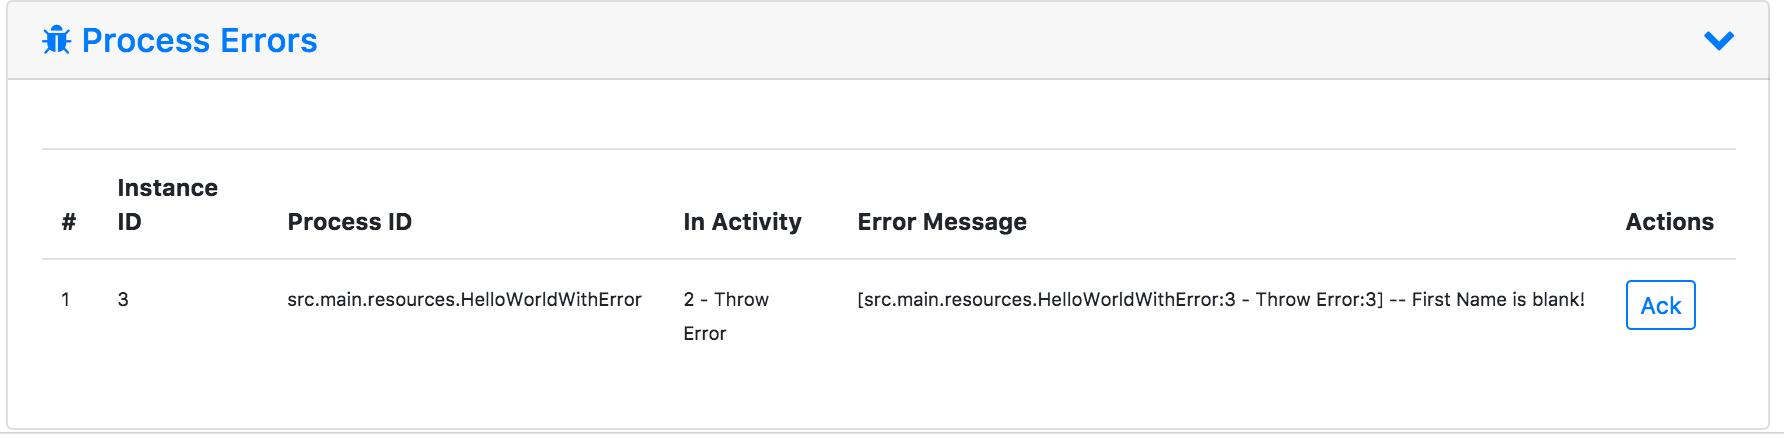 Processing Errors